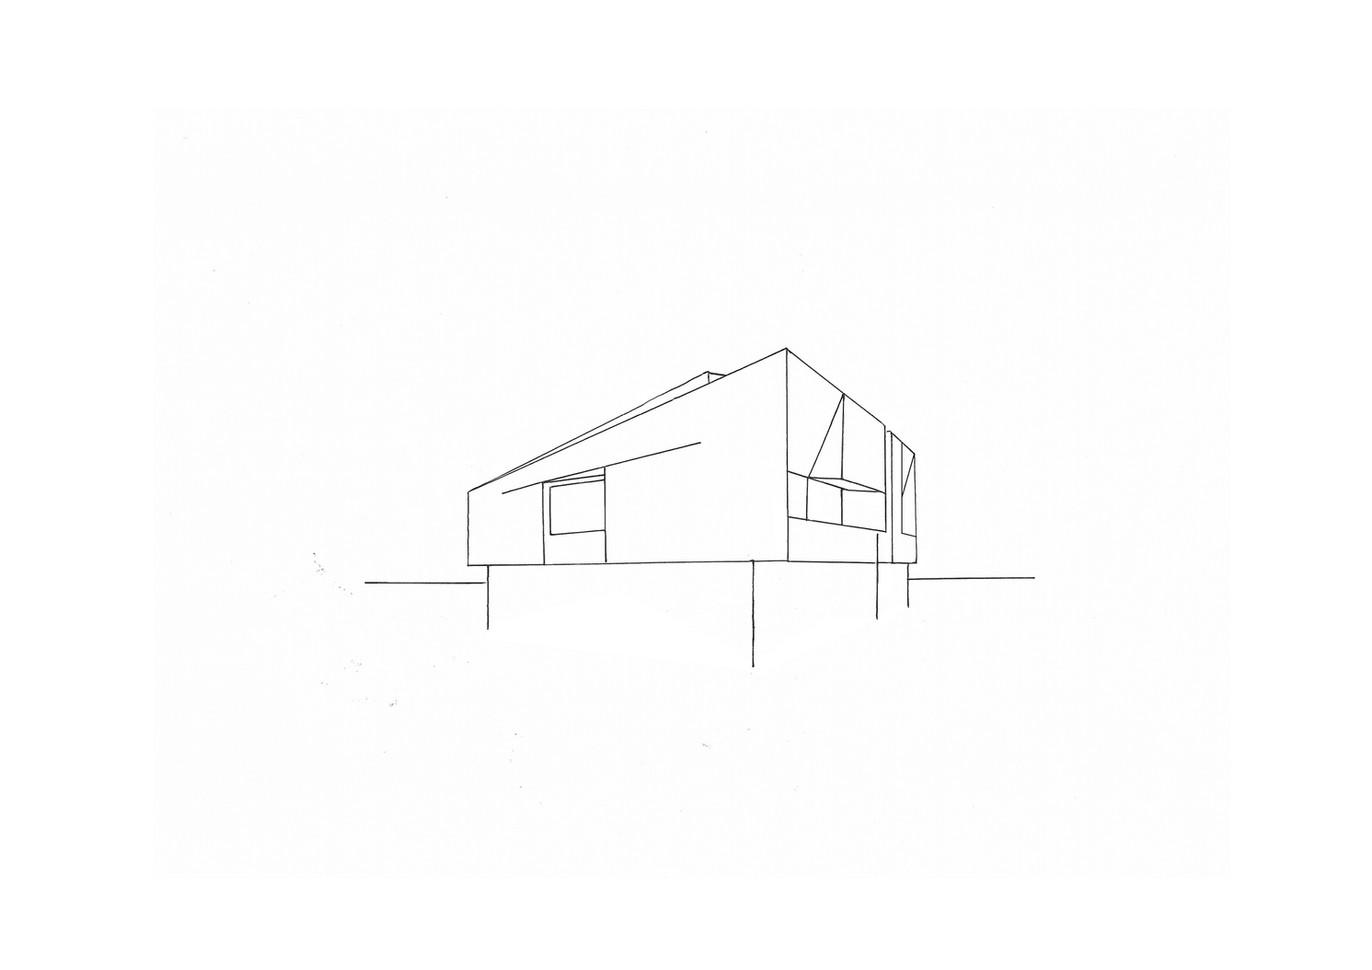 Burgi Sketch small 2.jpg